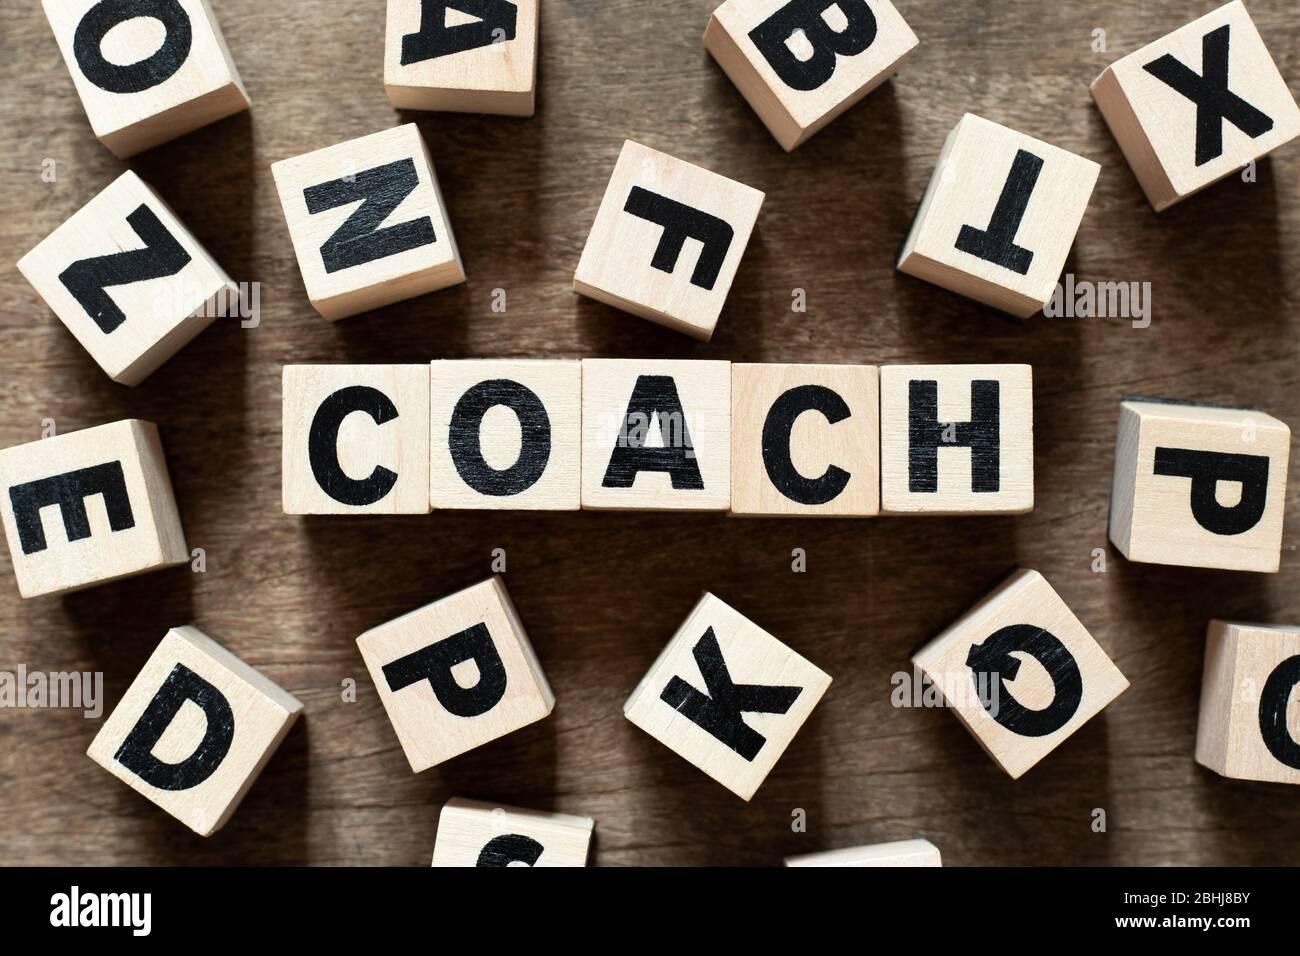 Coach word